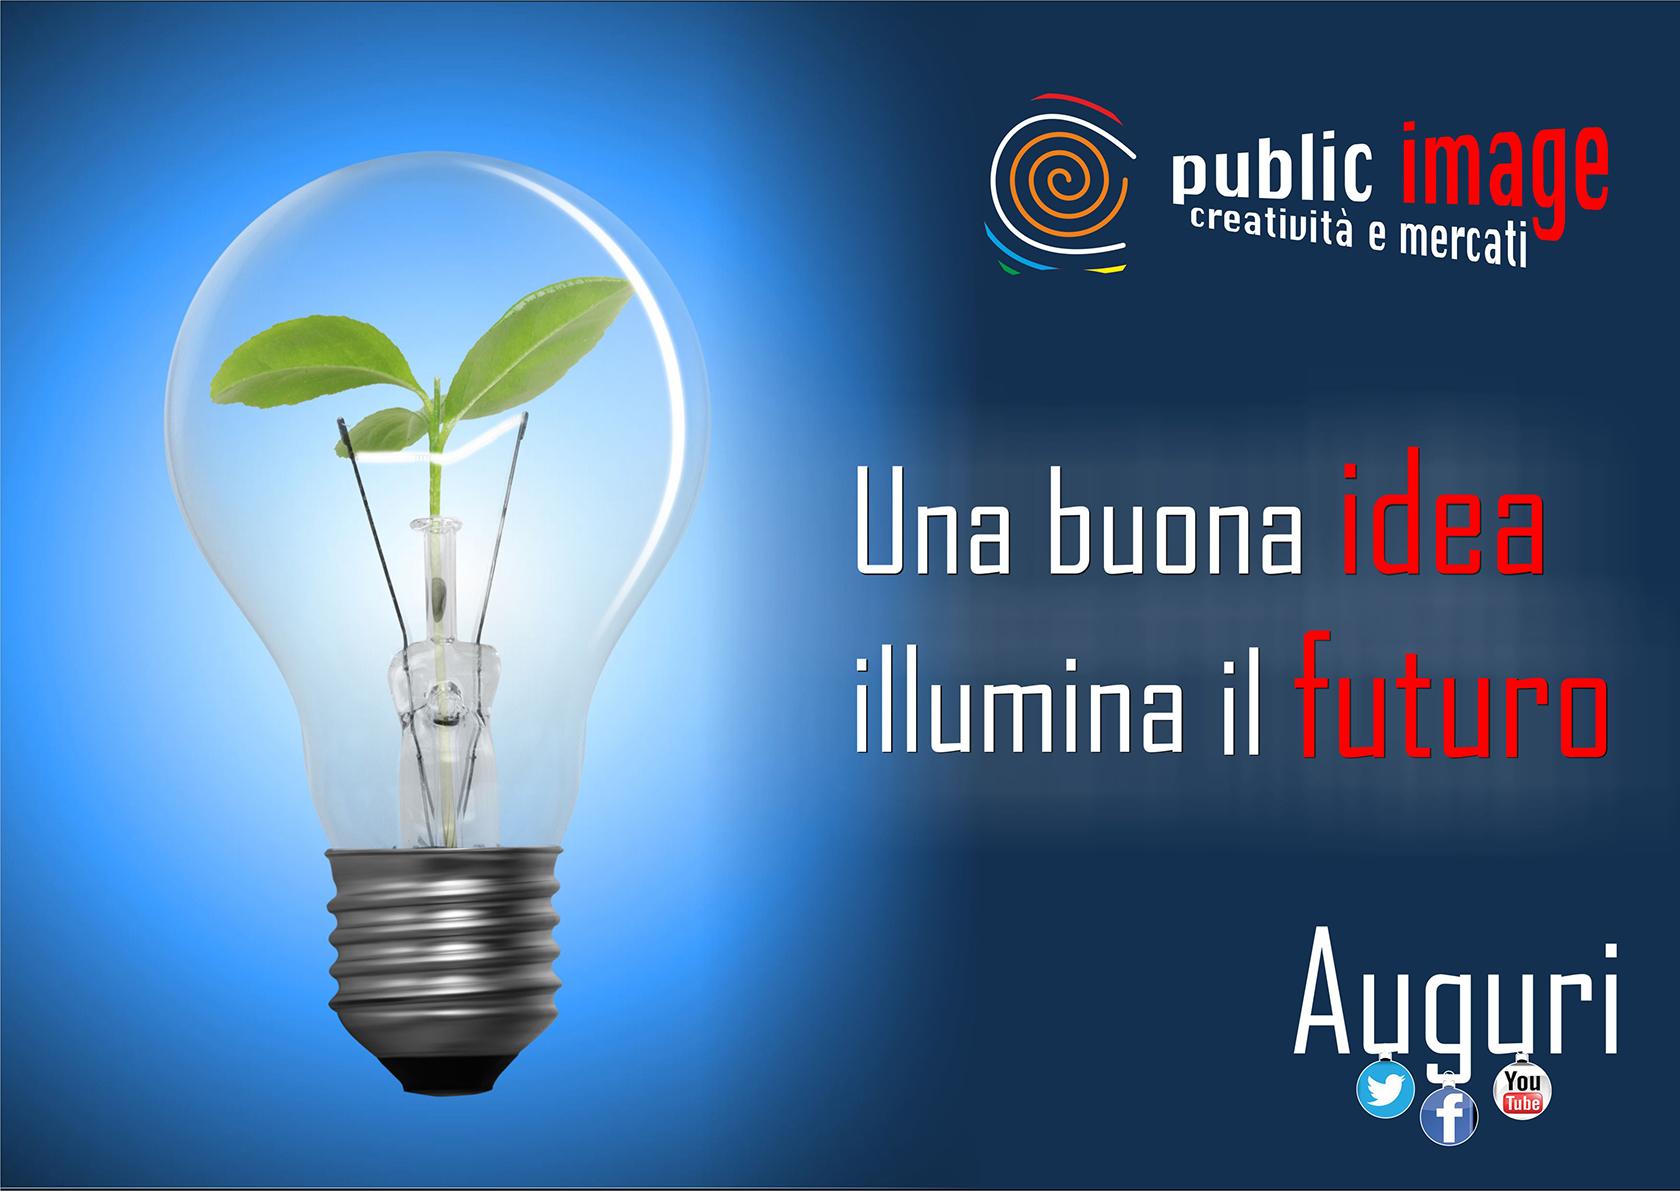 auguri-natale-2020-public-image